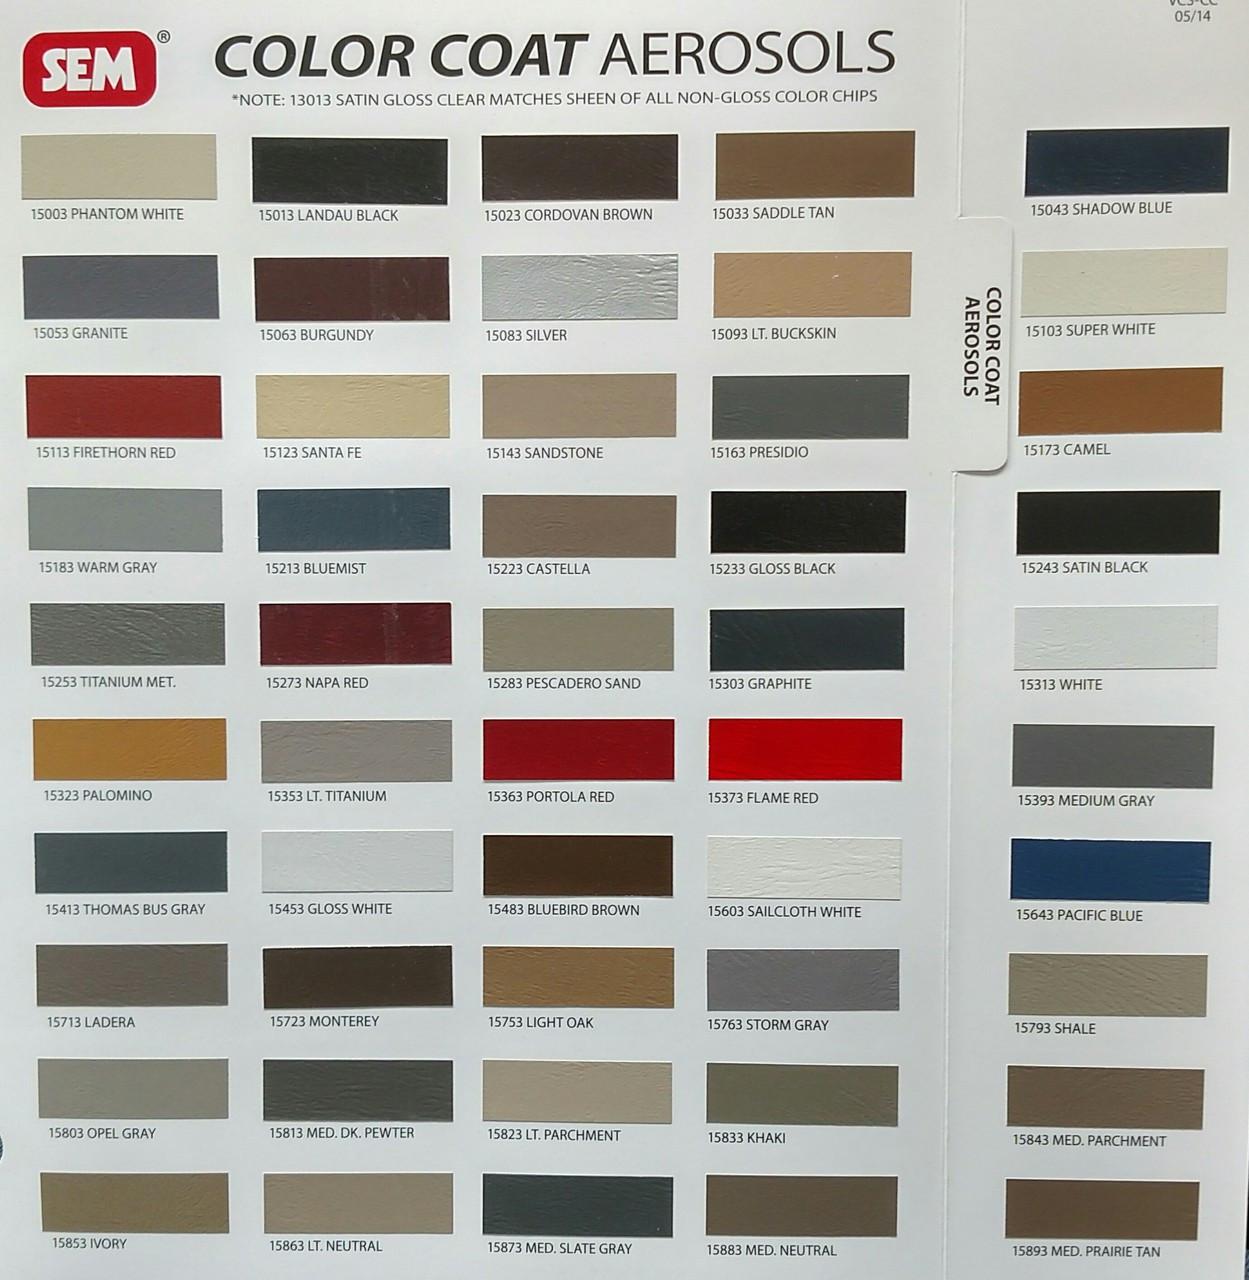 SEM COLOR COAT Aerosol - 12 oz. Flexible Coating Sample Card